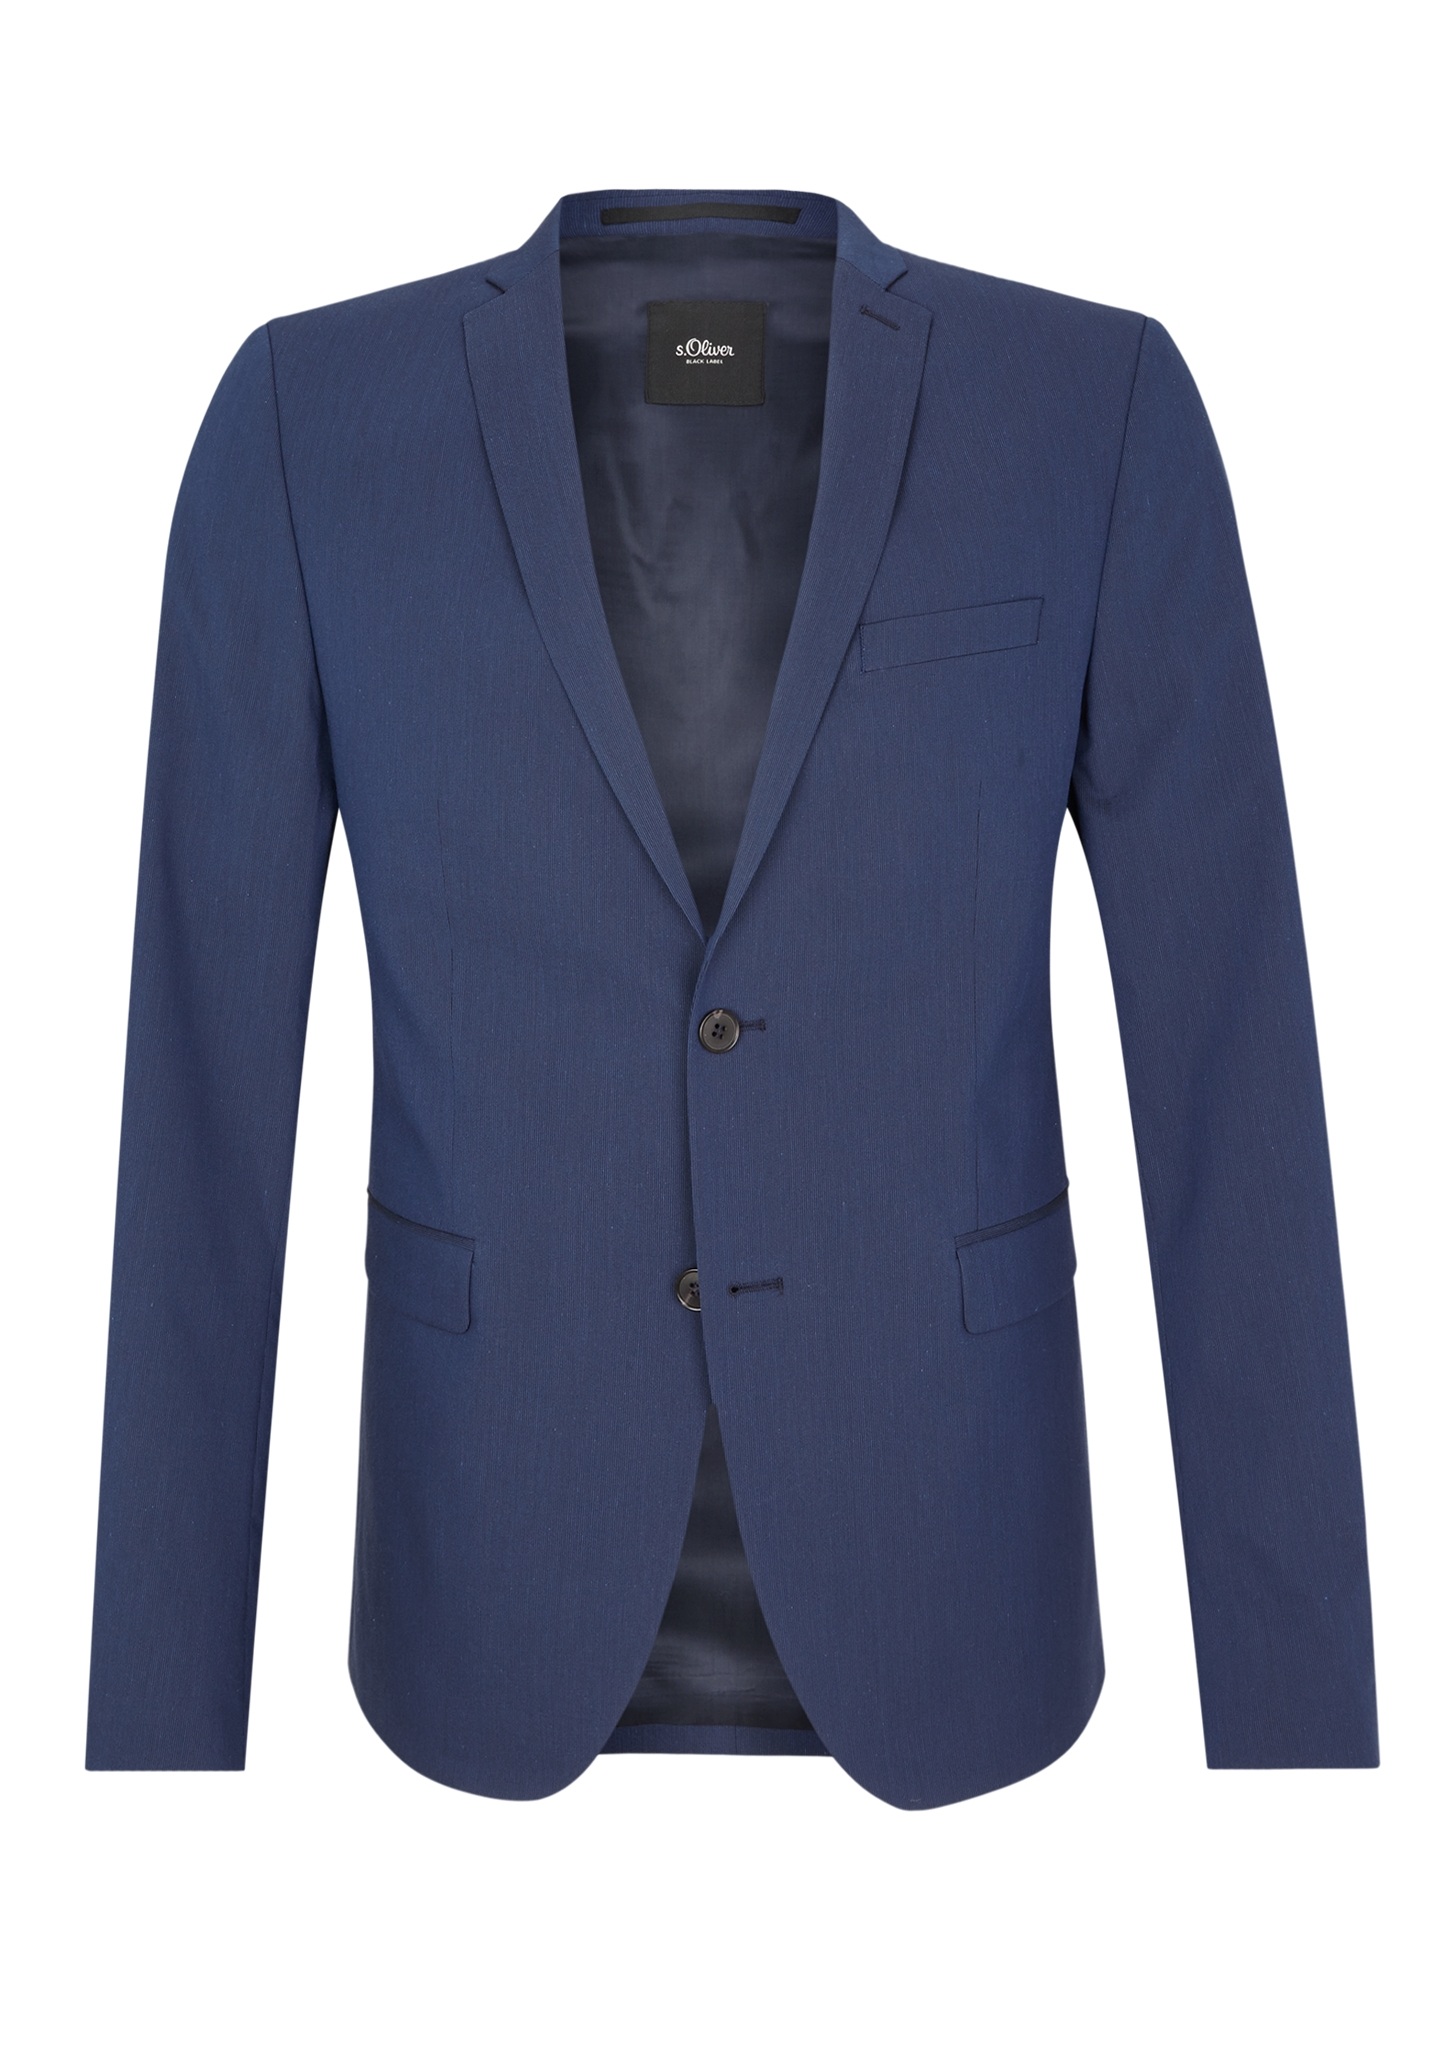 Sakko | Bekleidung > Sakkos > Sonstige Sakkos | Blau | Obermaterial 64% baumwolle -  32% polyester -  4% elasthan| futter 54% acetat -  46% viskose | s.Oliver BLACK LABEL